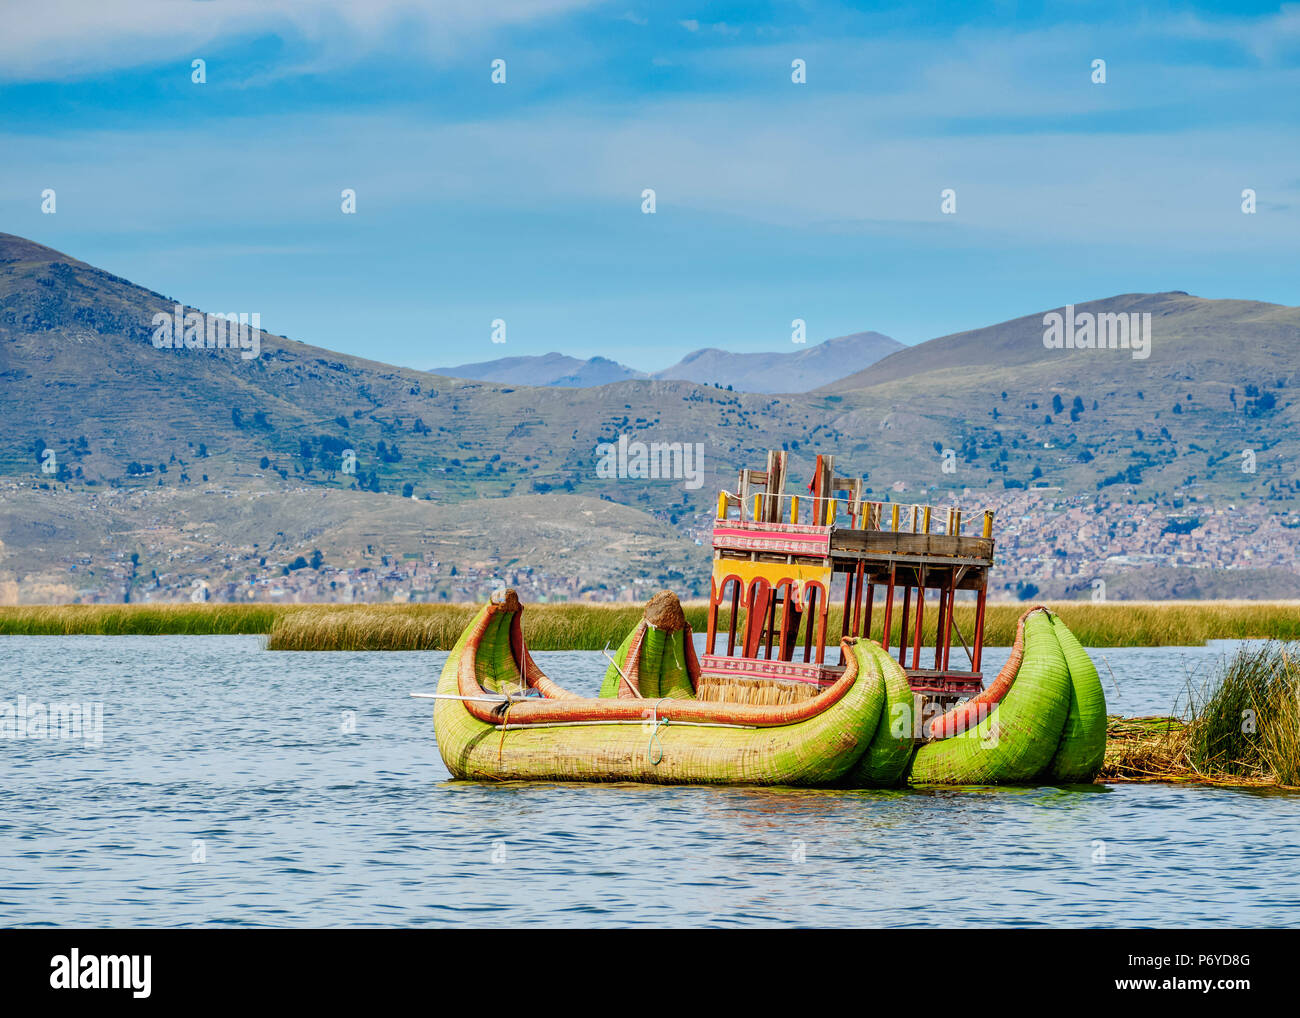 Traditional Reed Boat, Uros Floating Islands, Lake Titicaca, Puno Region, Peru - Stock Image